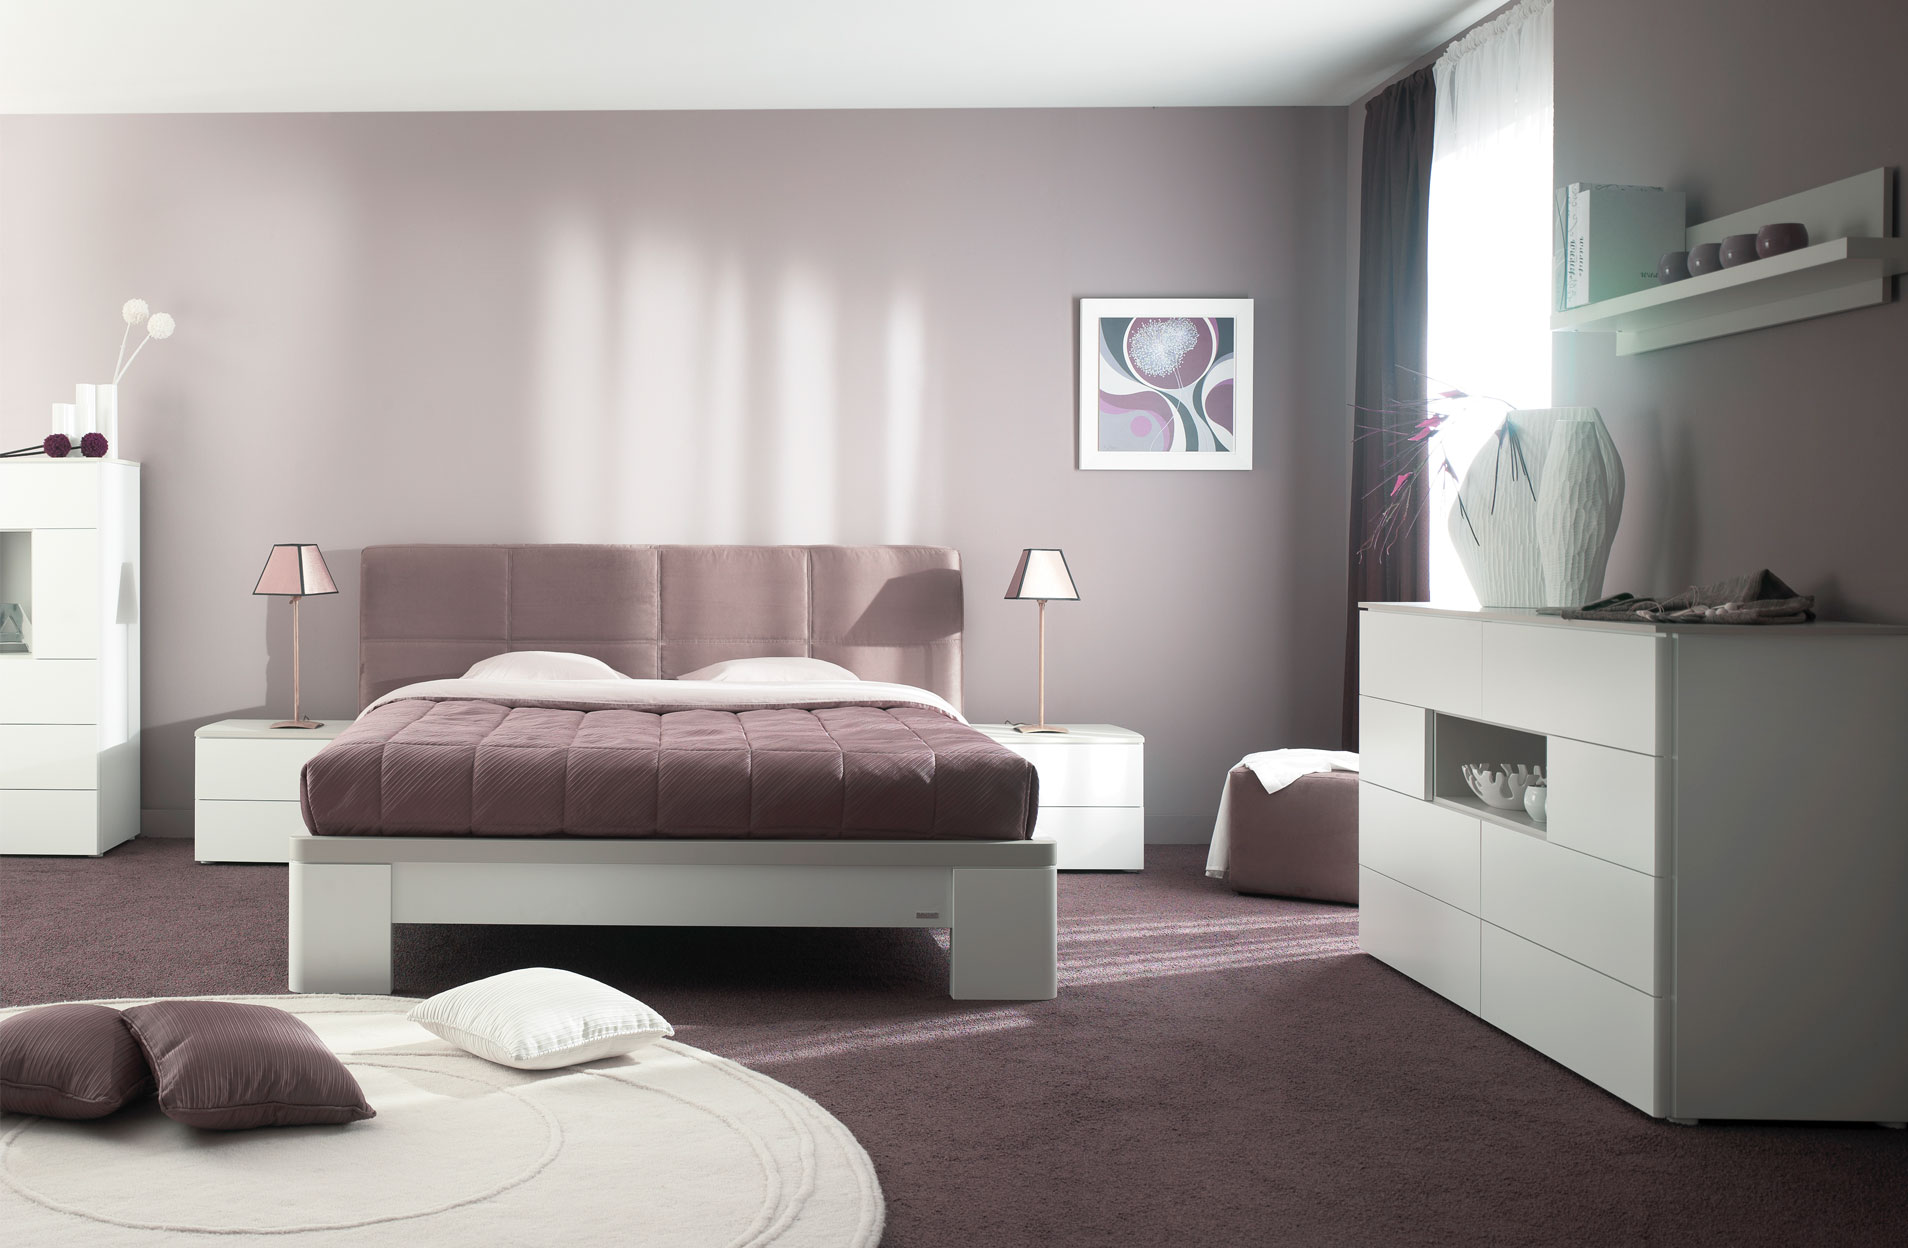 Inspiration Dcoration De Chambre Contemporaine Gautier Opalia